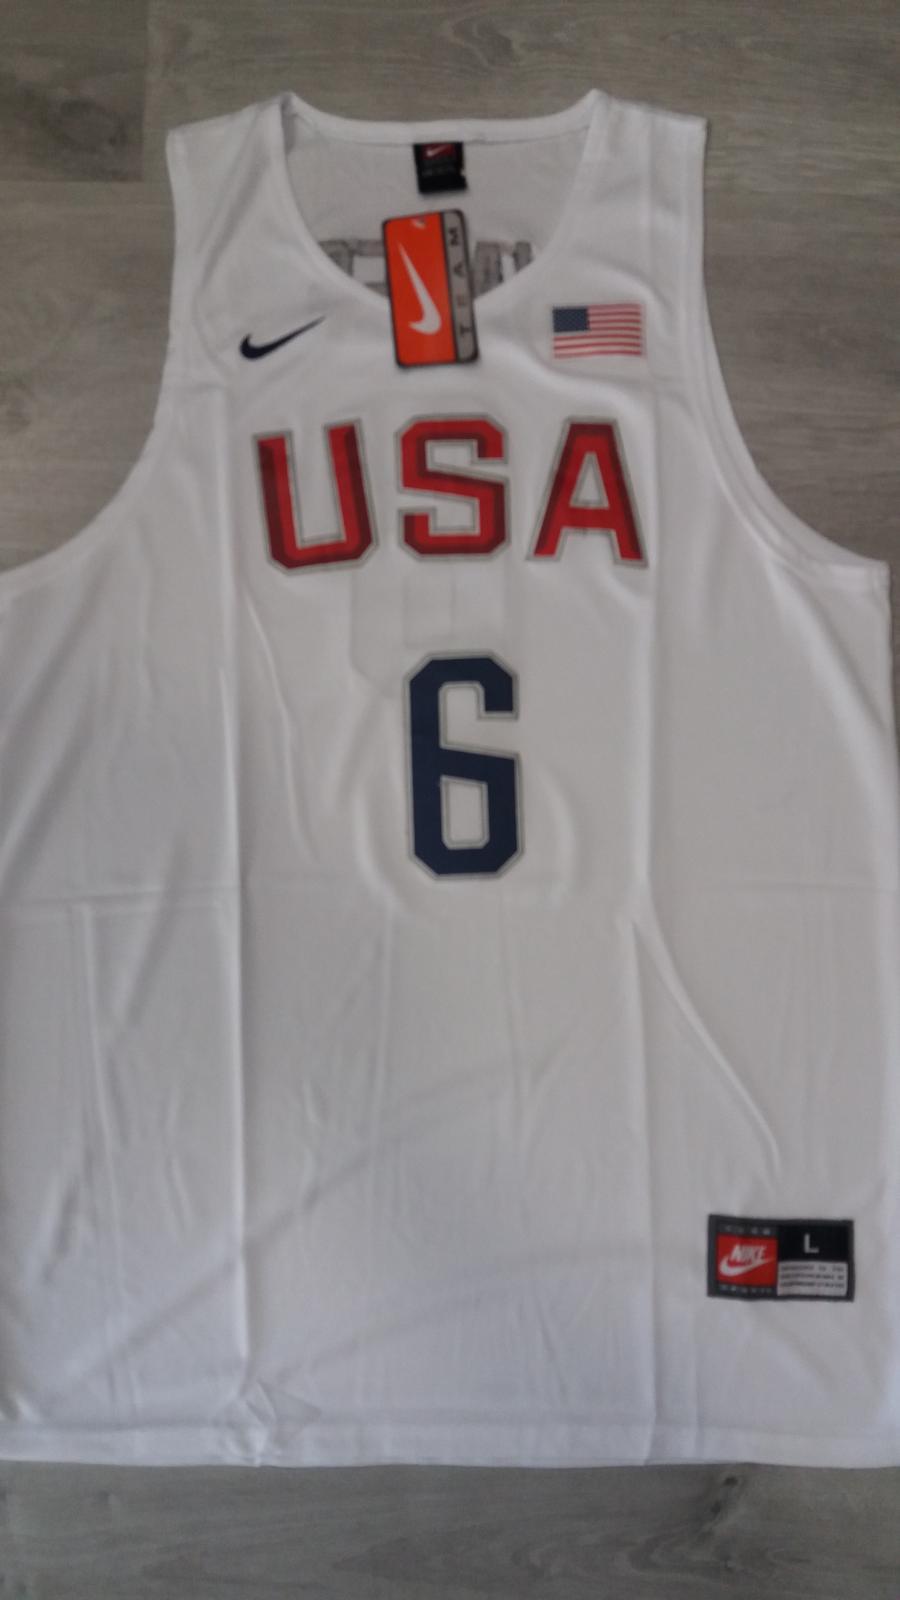 USA National Basketball Team #6 LeBron James White Stitched 2016 Rio de Janeiro Olympic Games Jersey